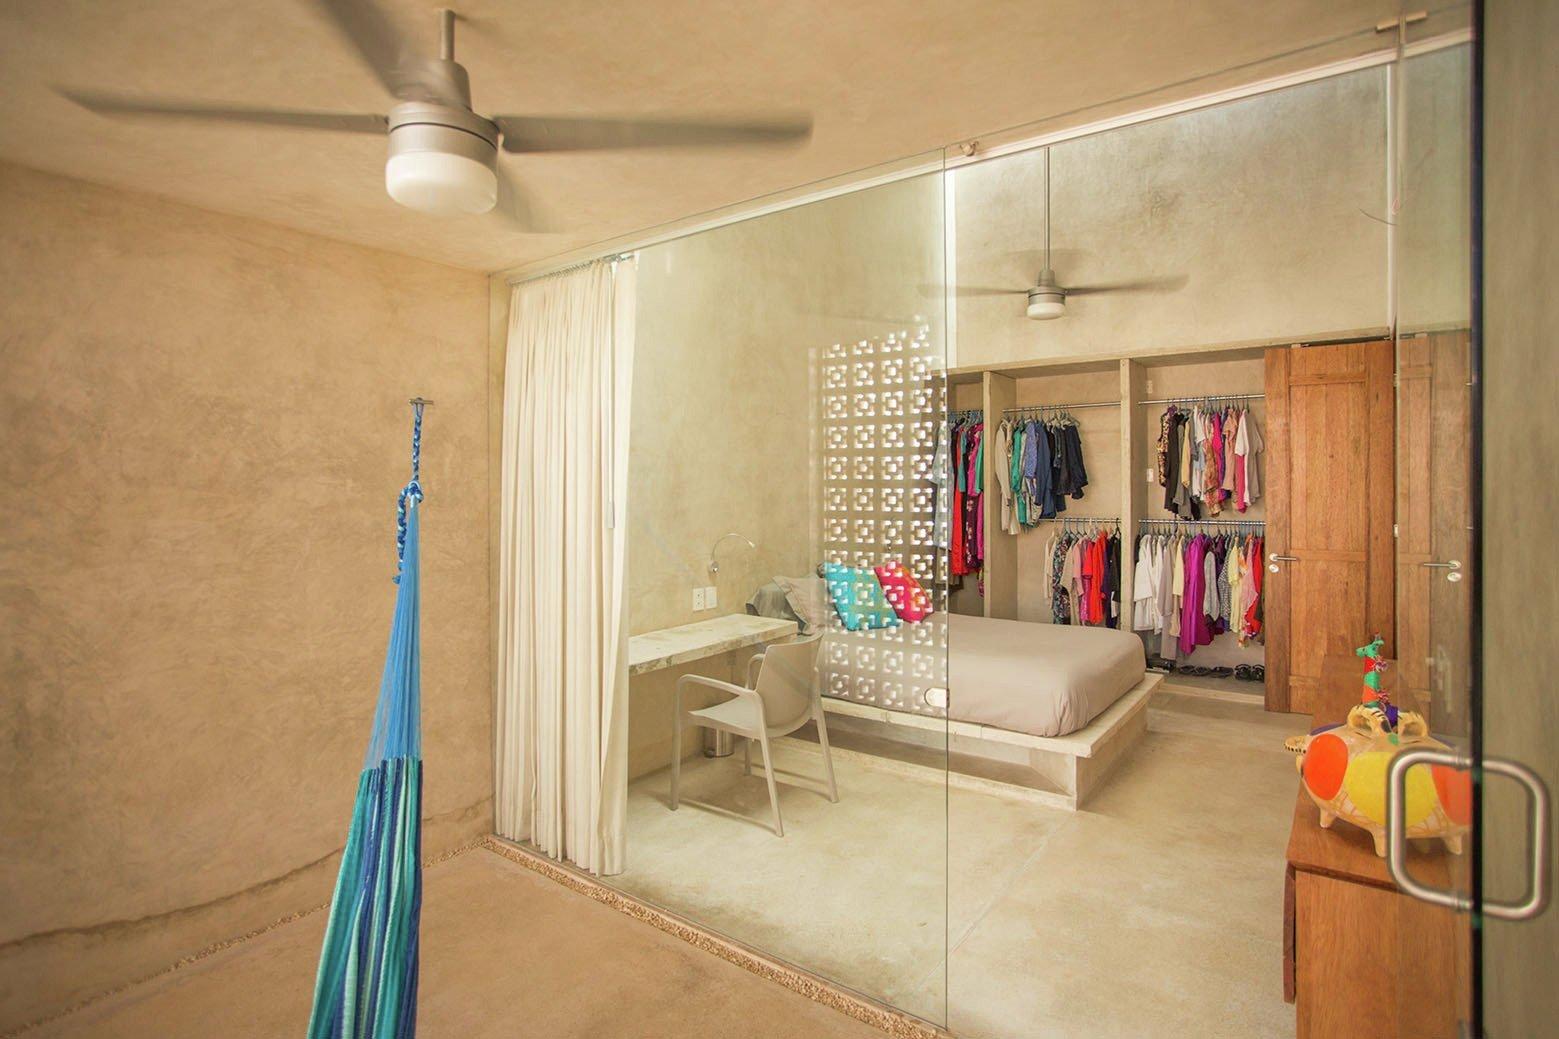 Gabriela House - TACO - Mexico - Bedroom - Humble Homes